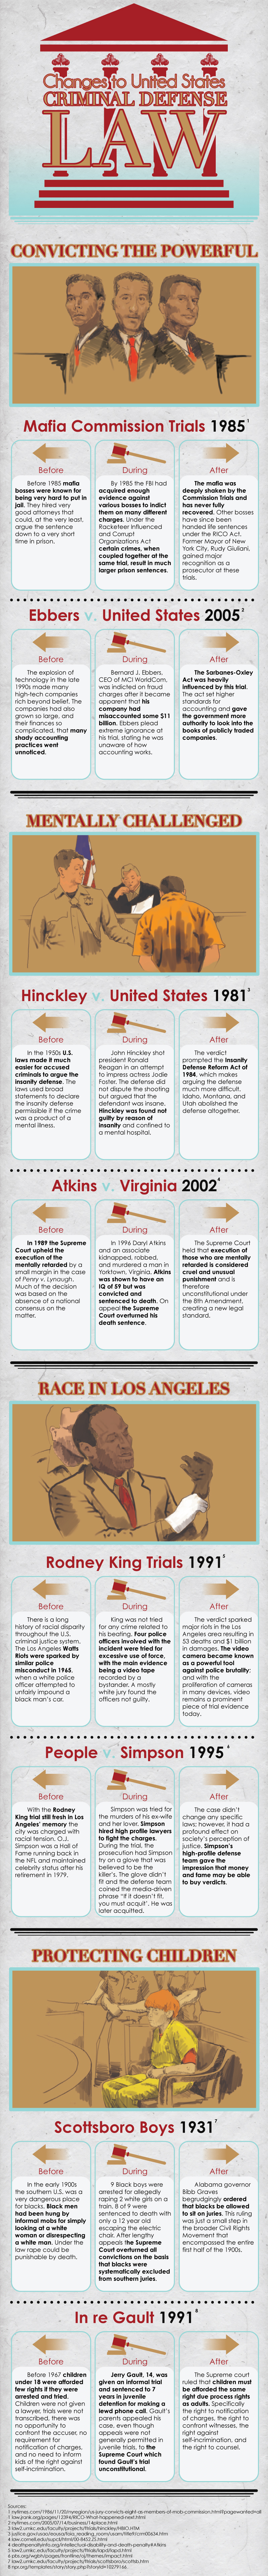 Biggest Criminal Cases